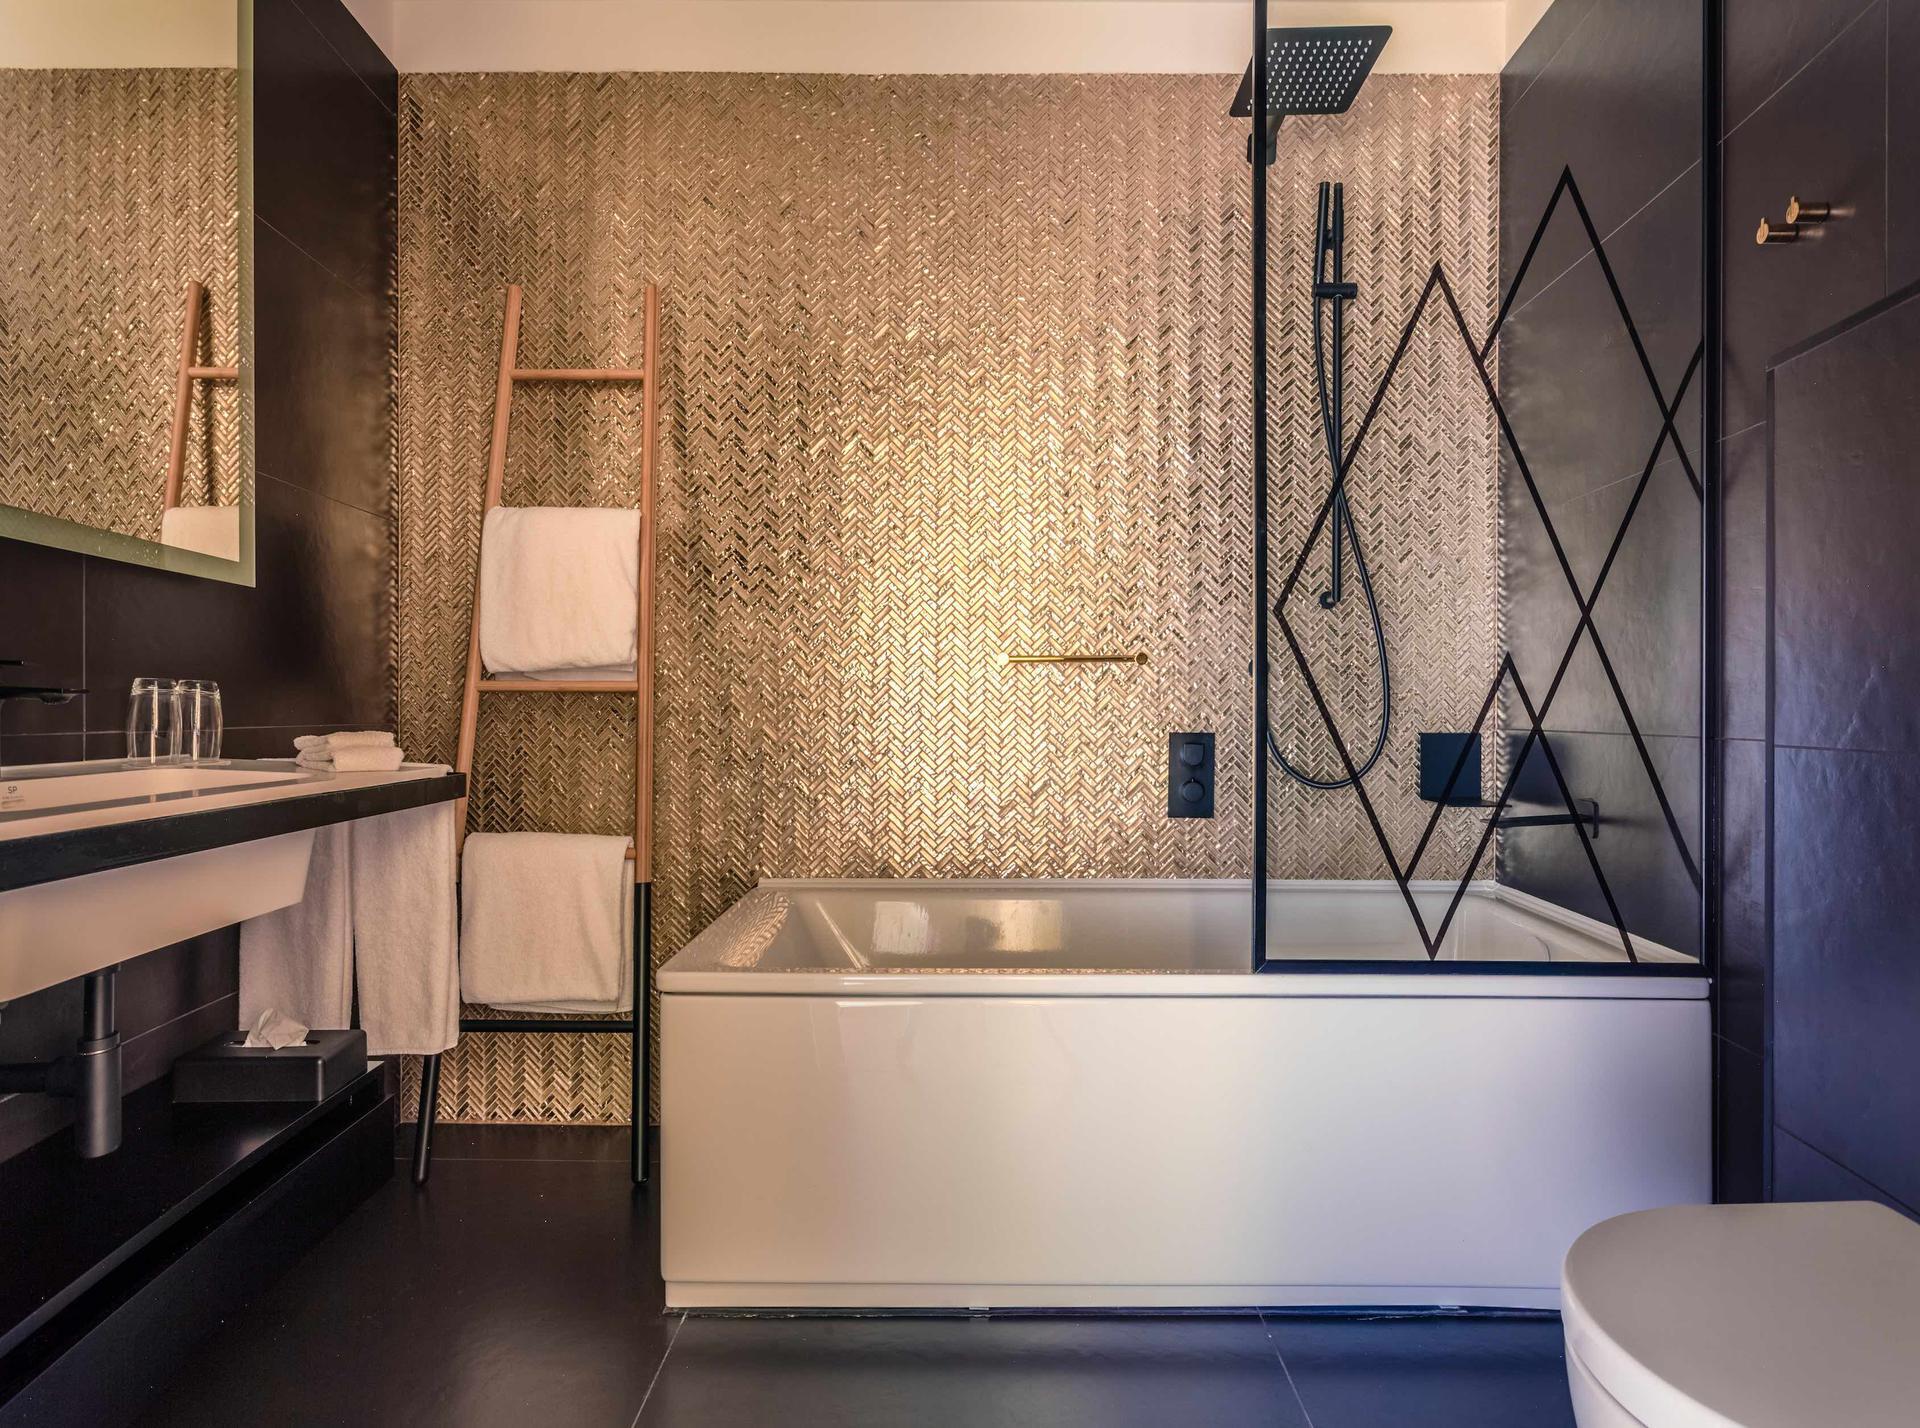 4_Kaldewei_Hotel_Indigo_Warsaw_Puro